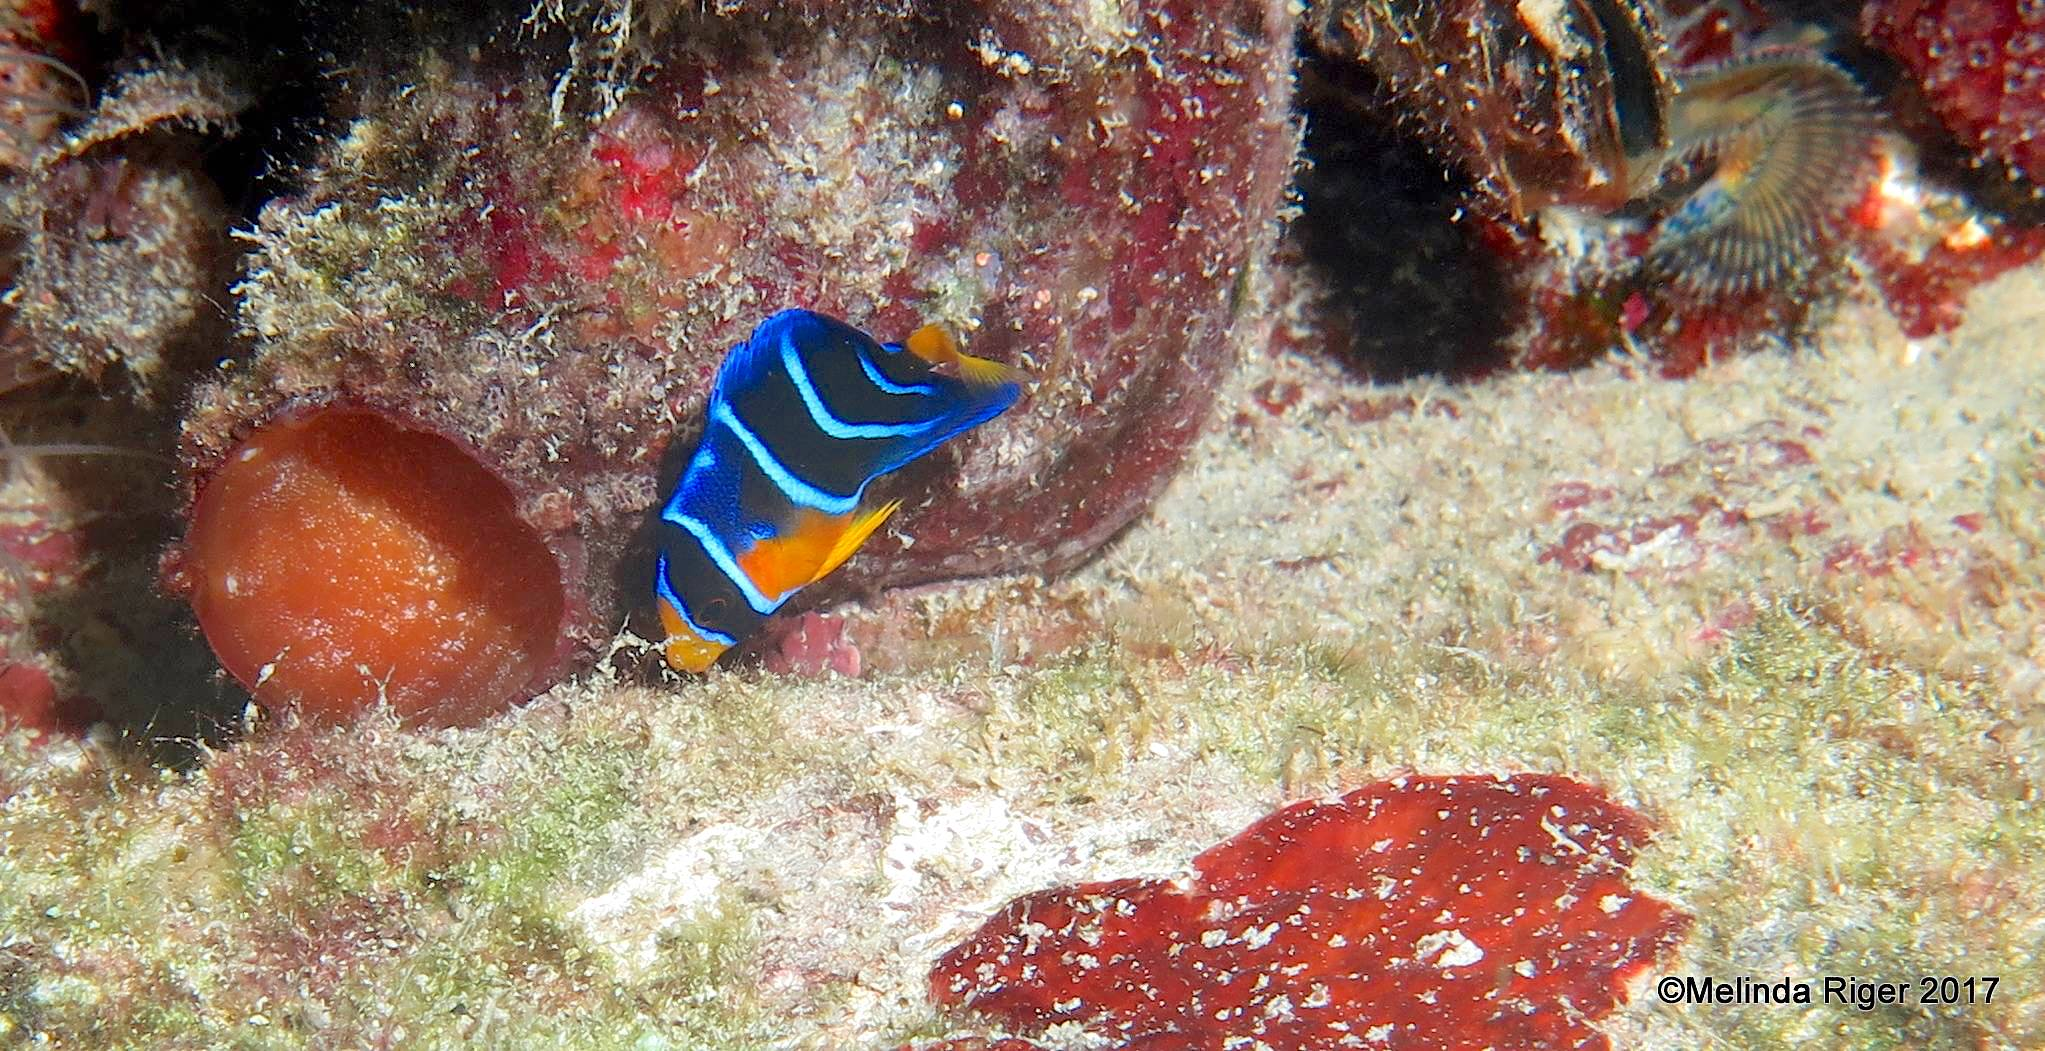 Queen Angelfish (Juvenile), Bahamas (Melinda Riger / Grand Bahama Scuba)